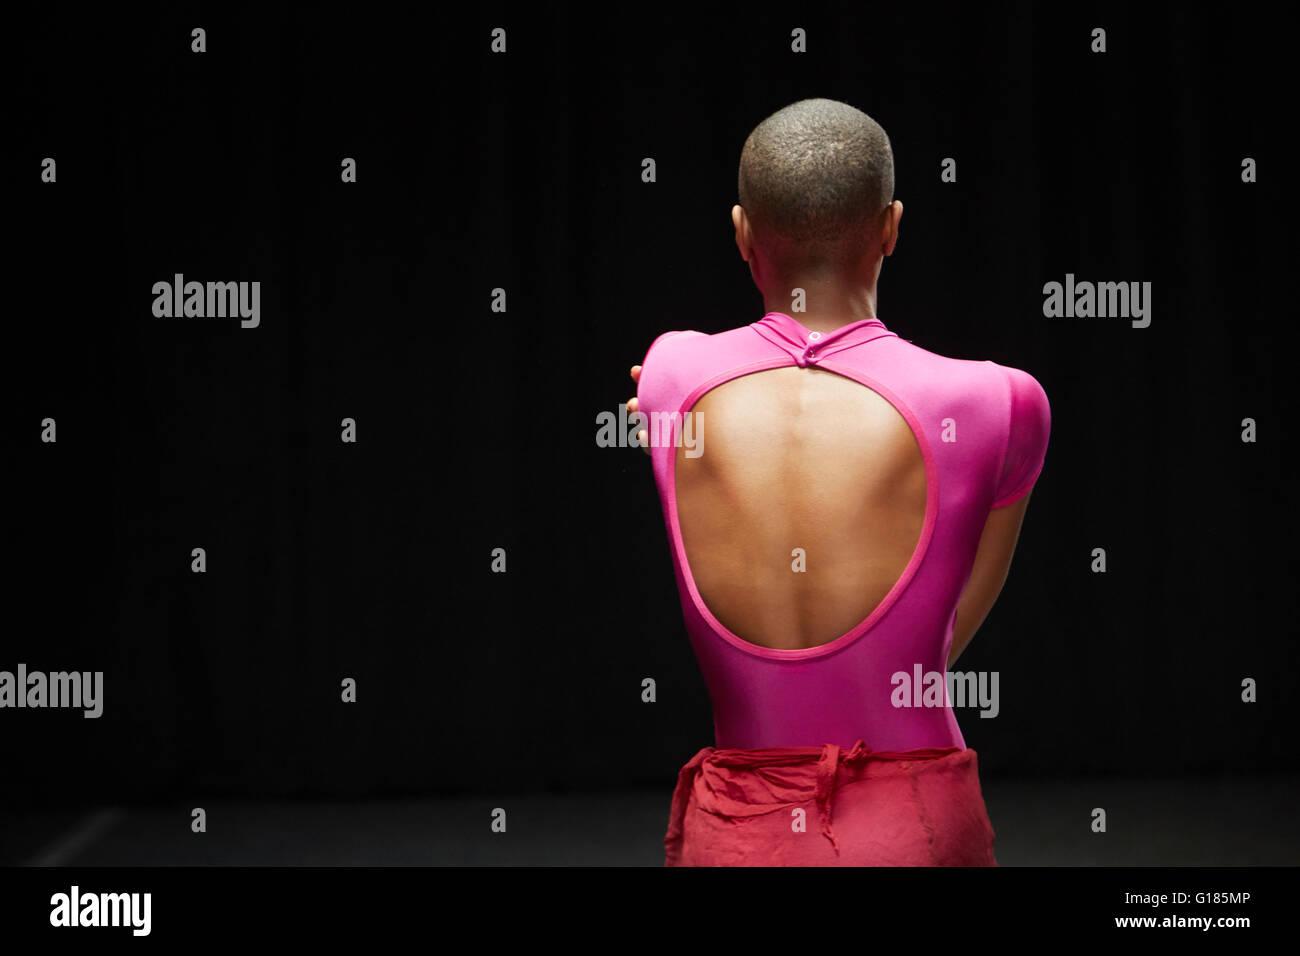 Backview of dancer - Stock Image